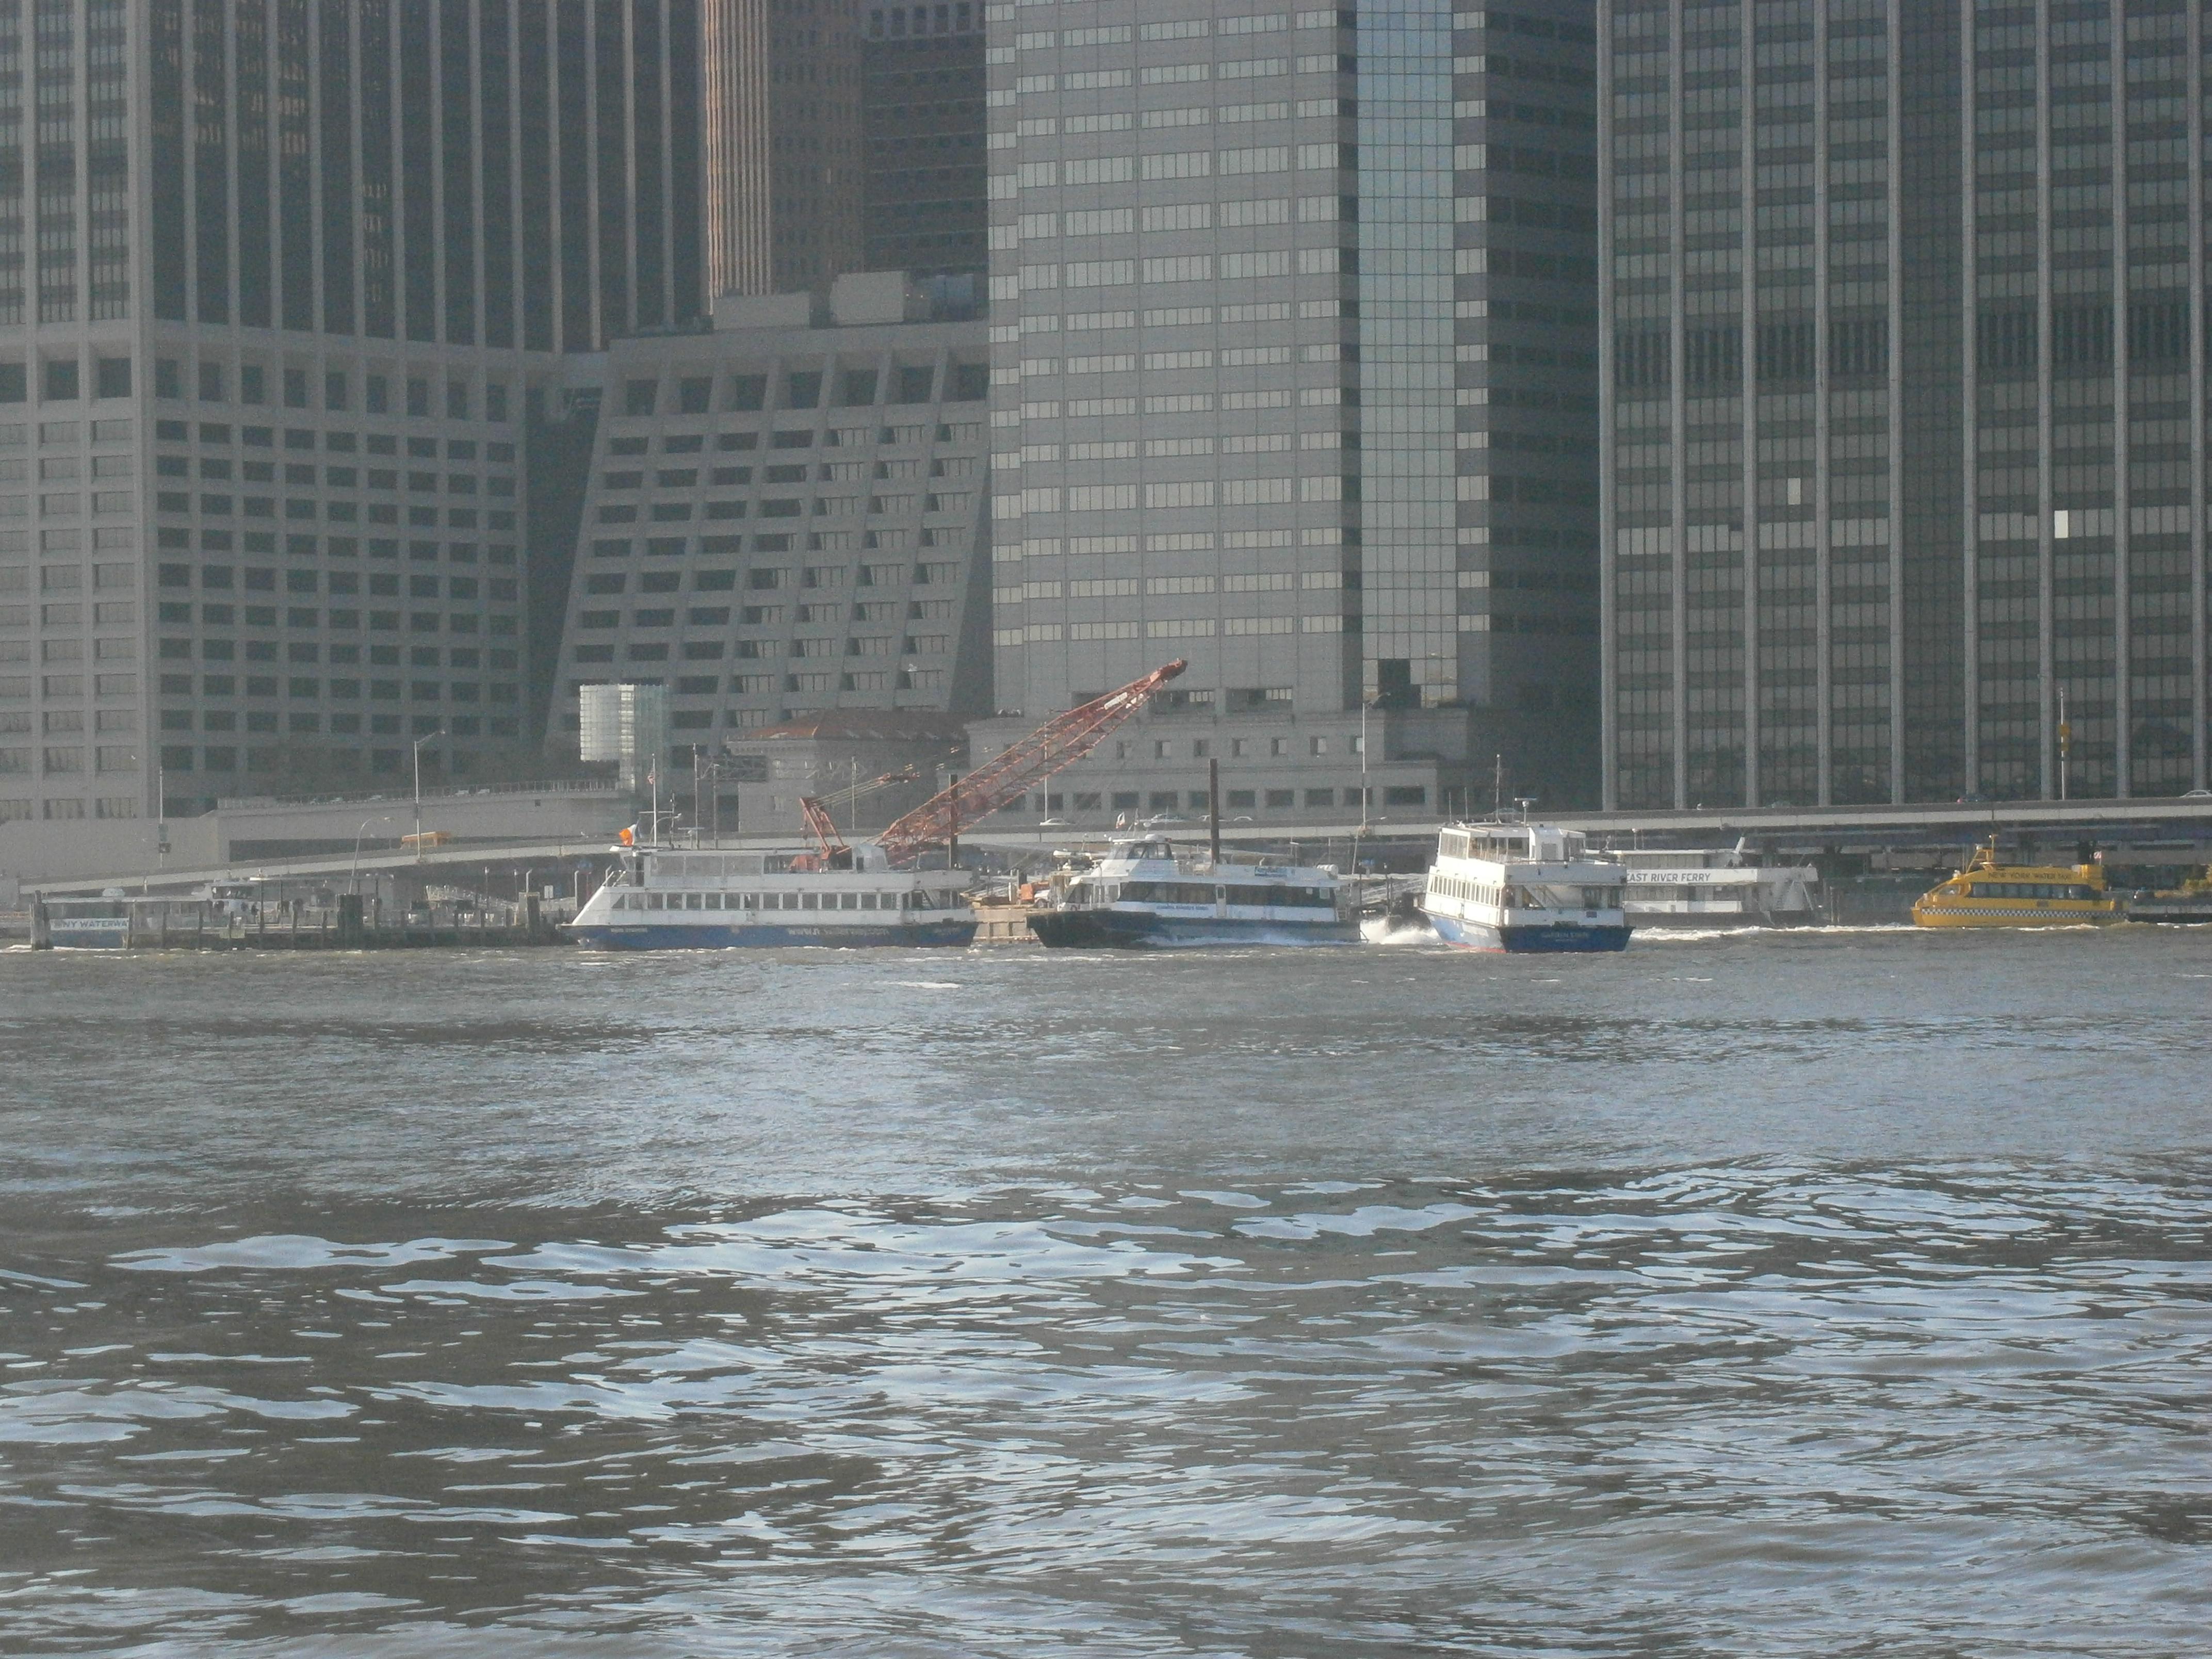 Pier 11/Wall Street - Wikipedia